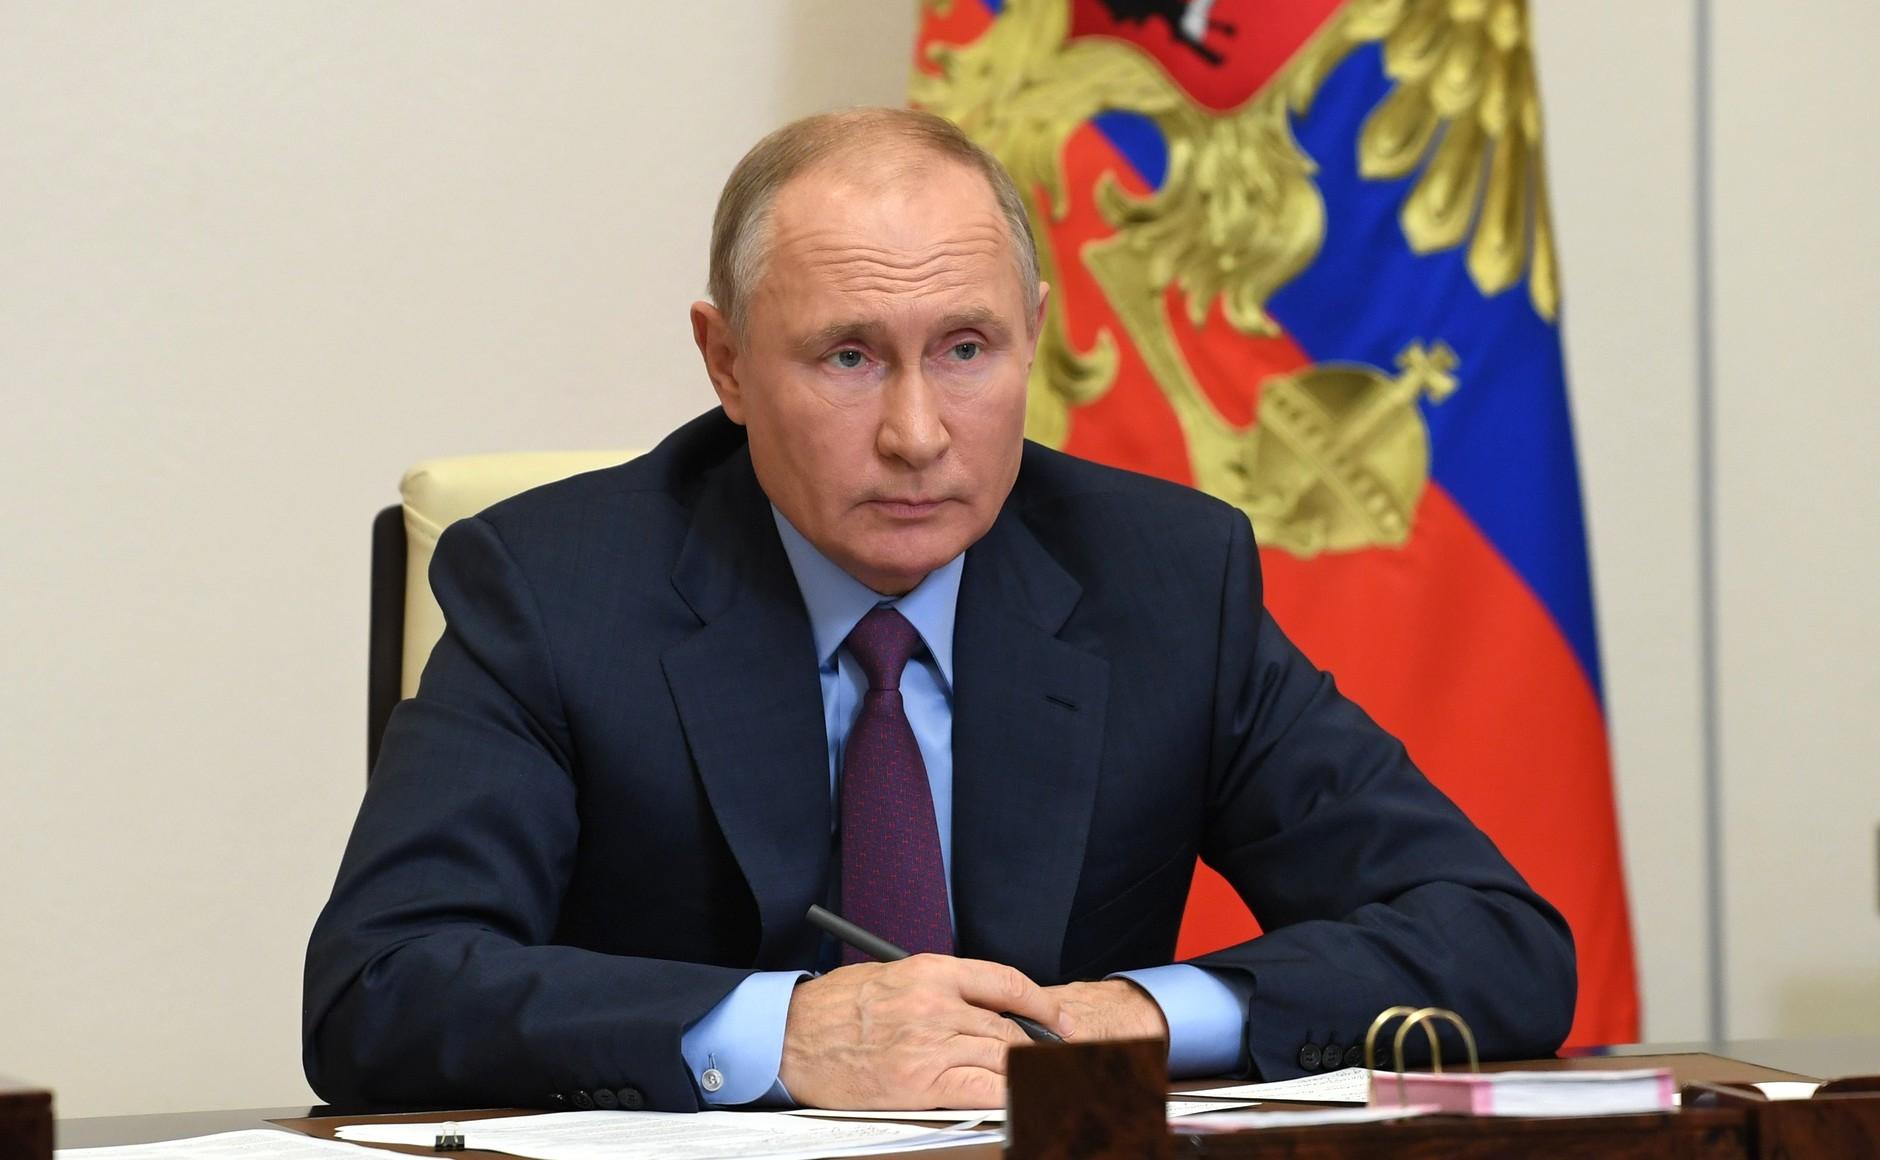 фото ЗакС политика Путин подписал закон, позволяющий ему обнулить президентские сроки